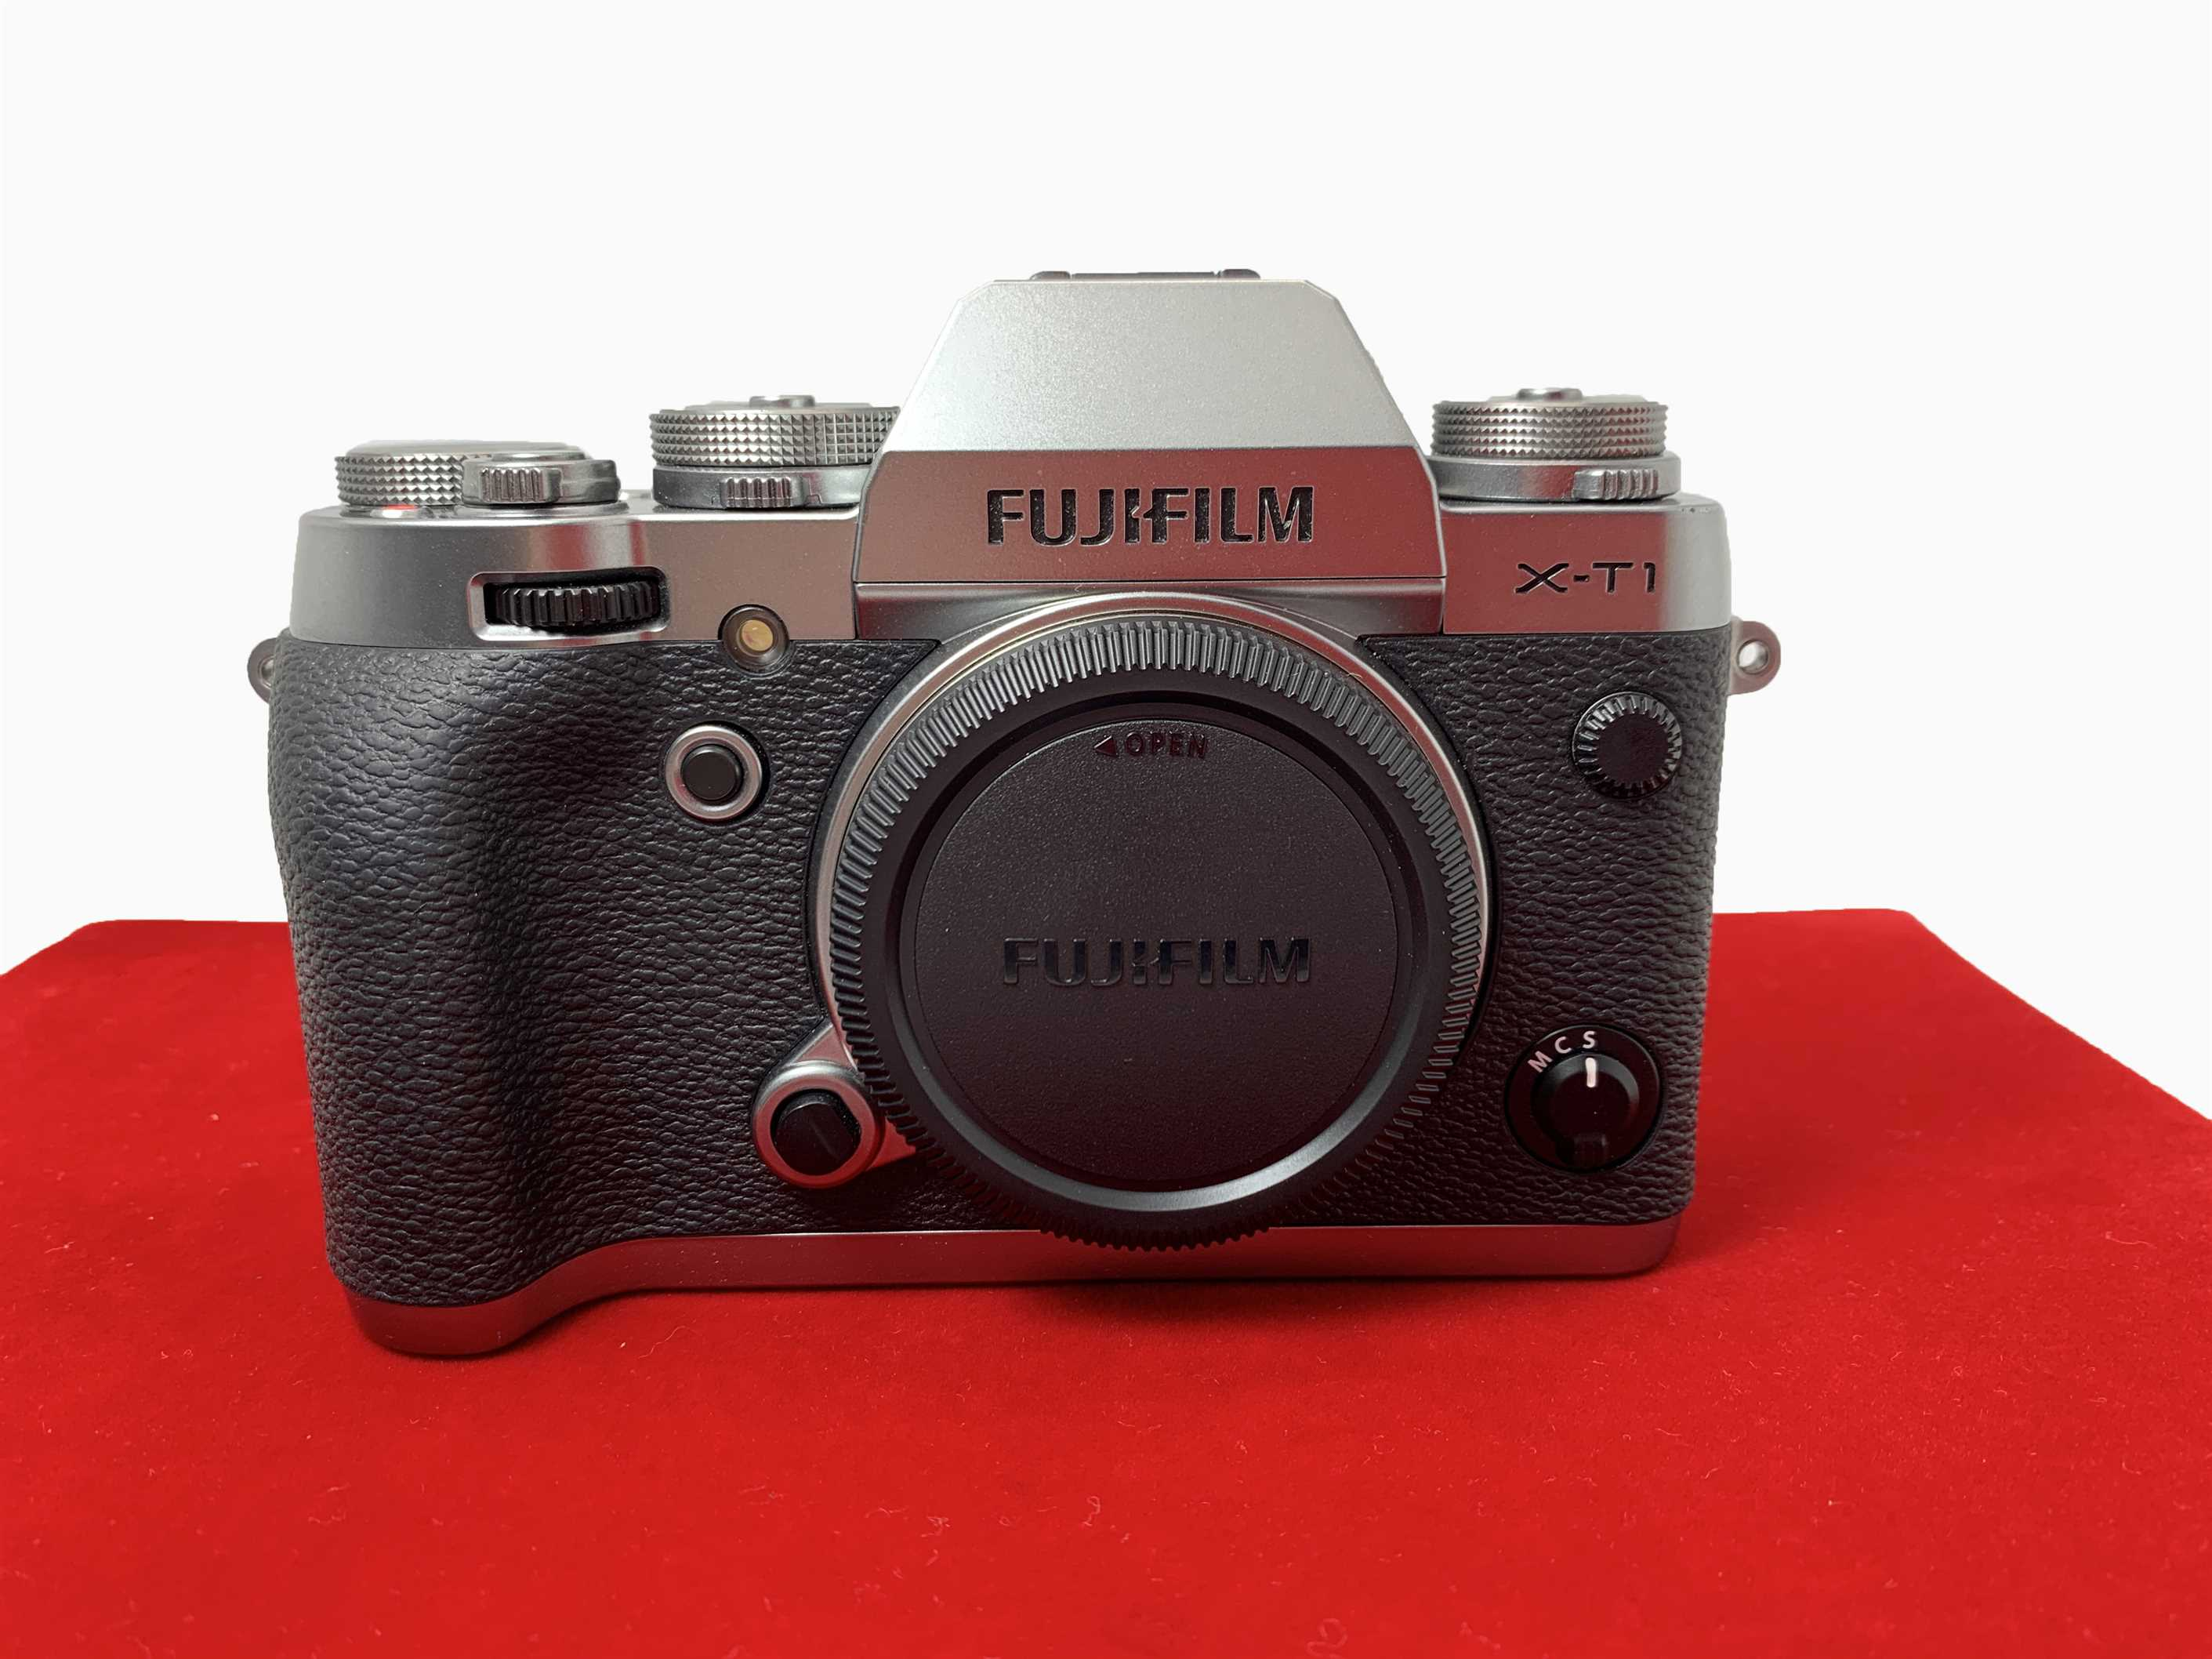 [USED-PJ33] Fujifilm XT-1 Camera Body (Graphite), 90% Like New Condition (S/N 51M00555)